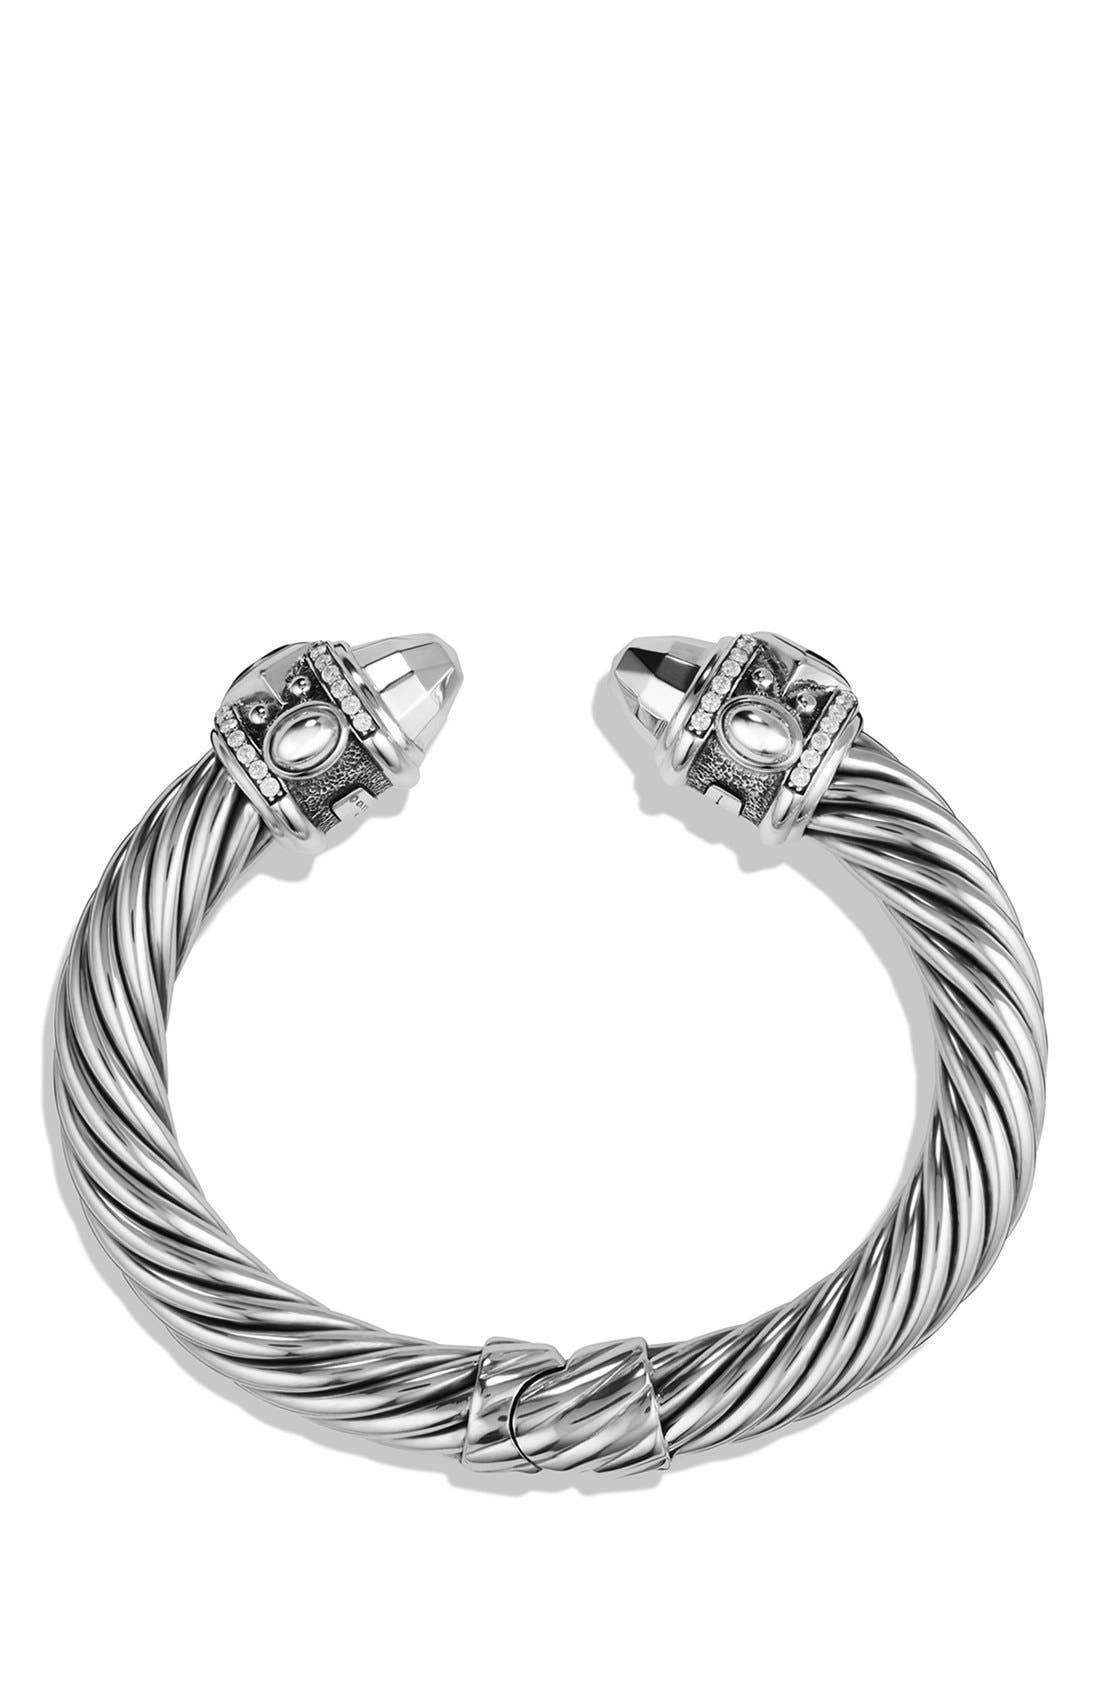 Alternate Image 2  - David Yurman 'Renaissance' Bracelet with Black Diamonds